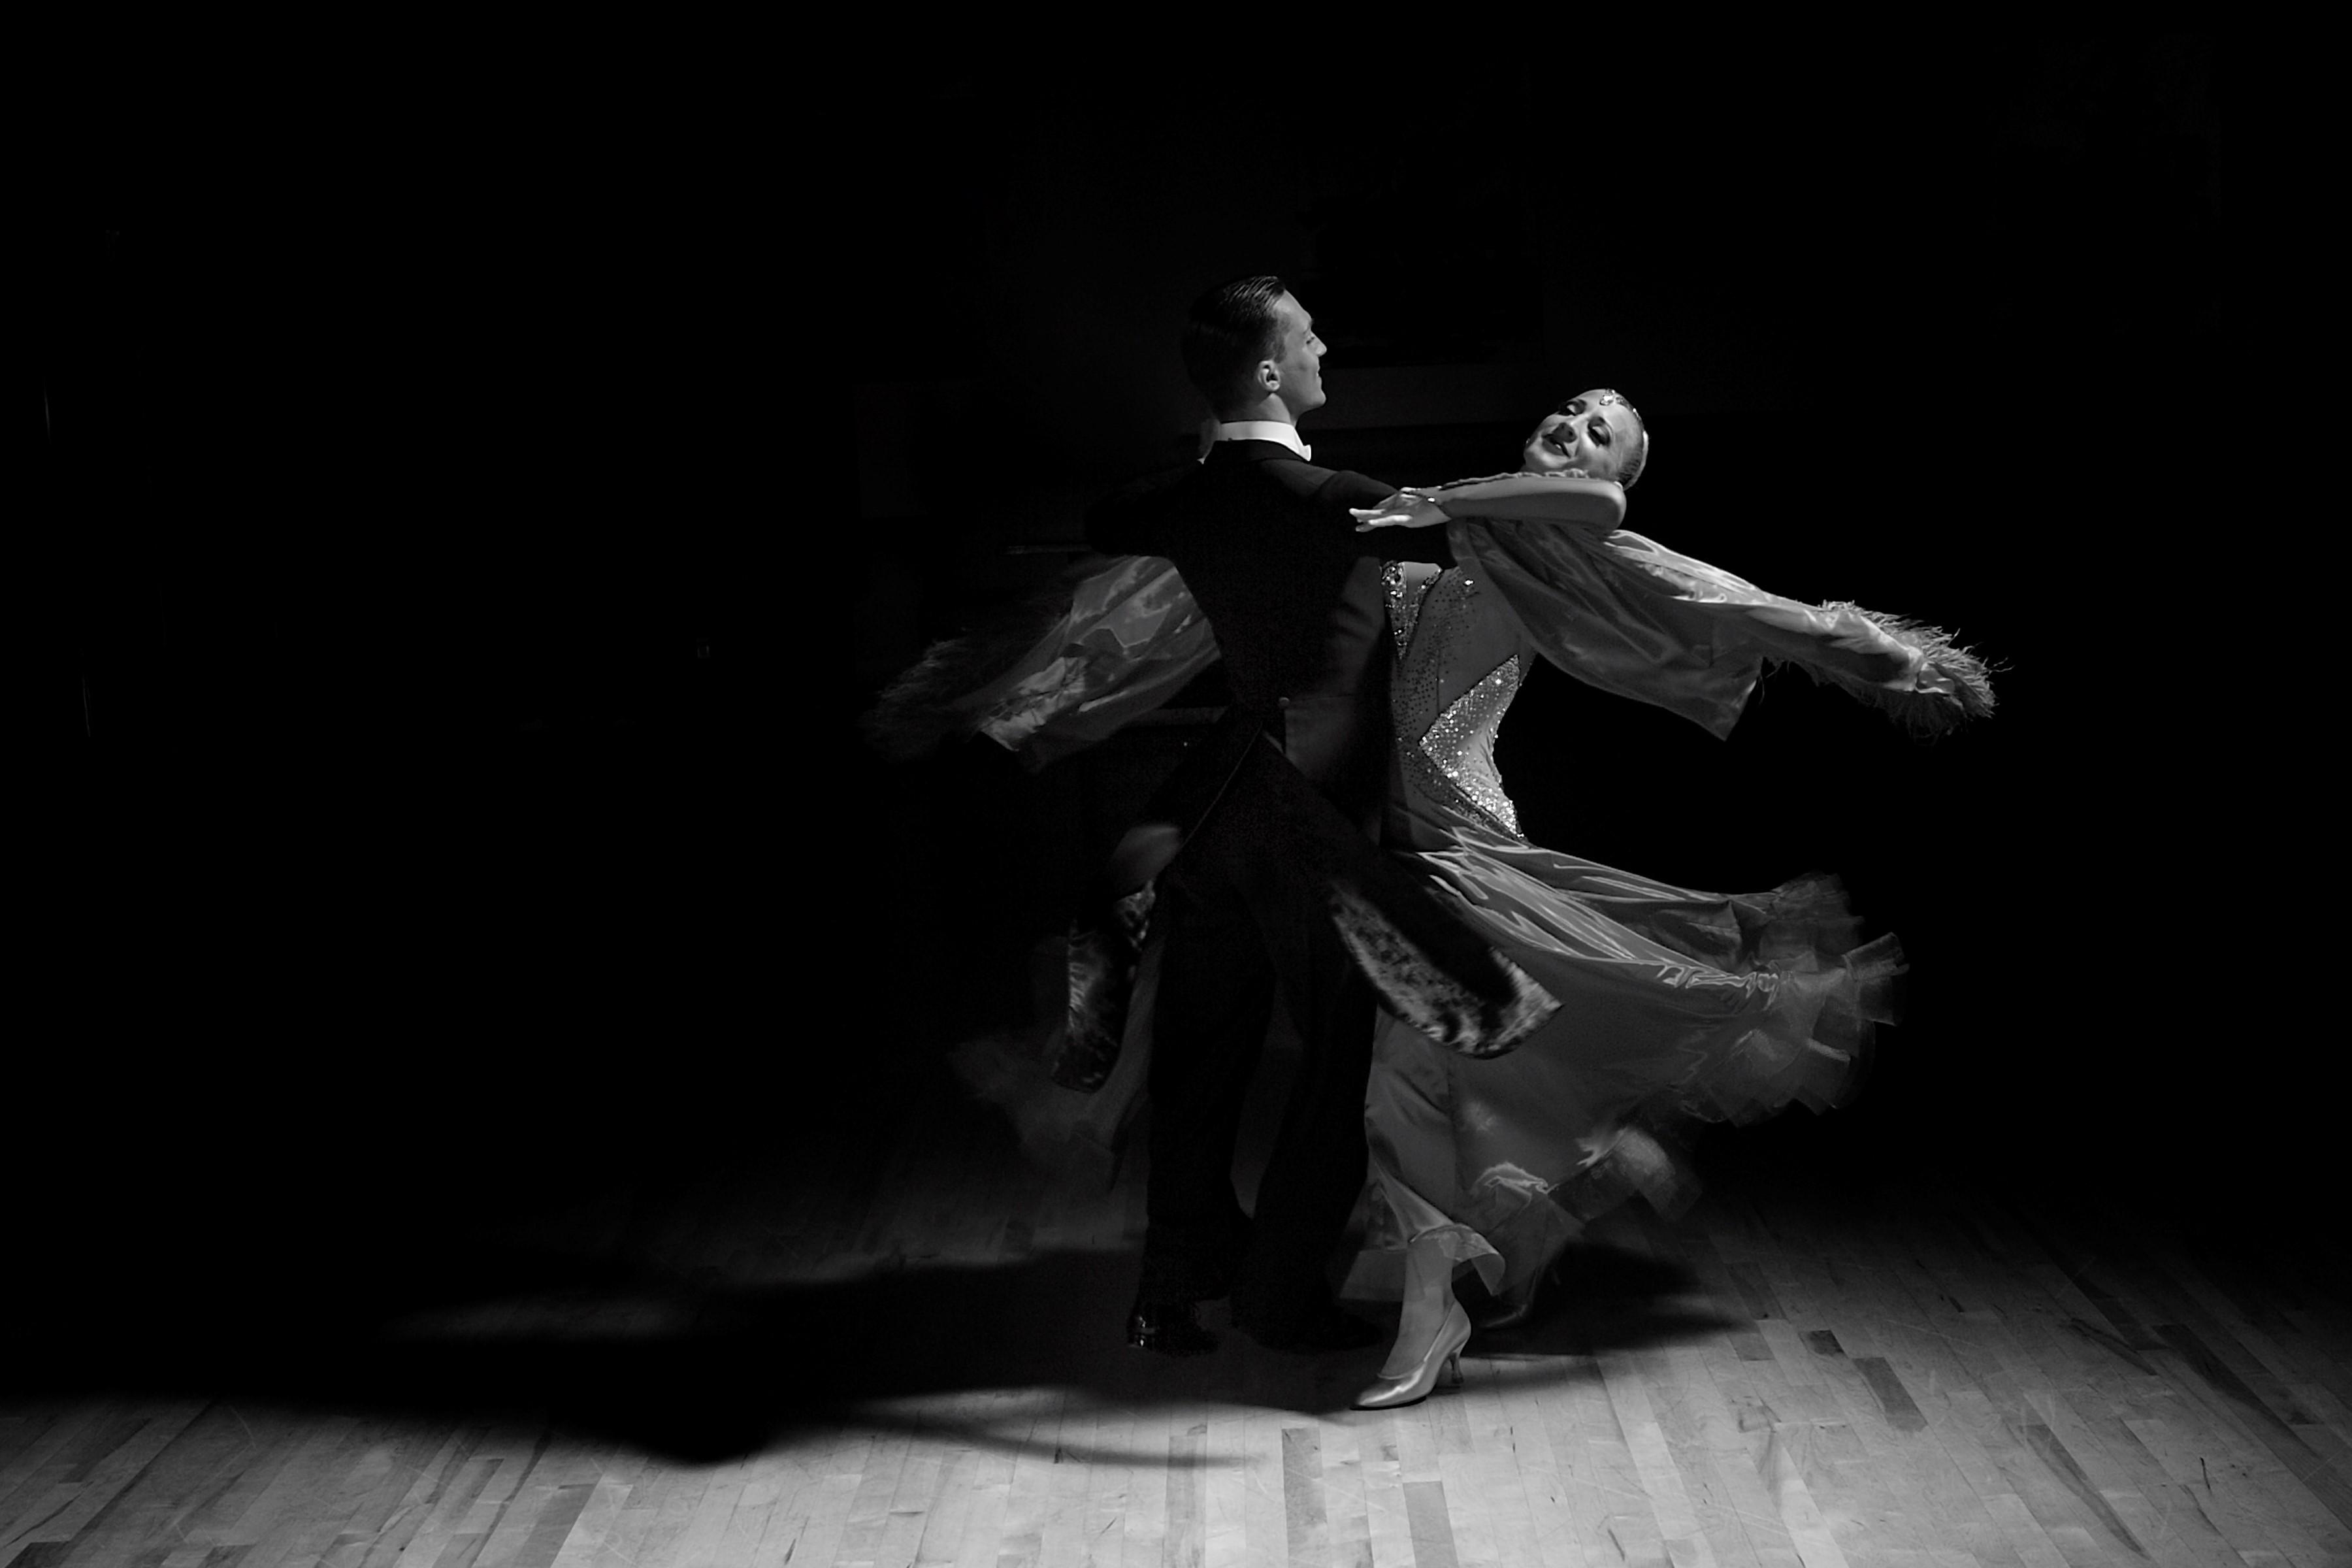 Dance Photography with the Strobelite Plus Westcott University